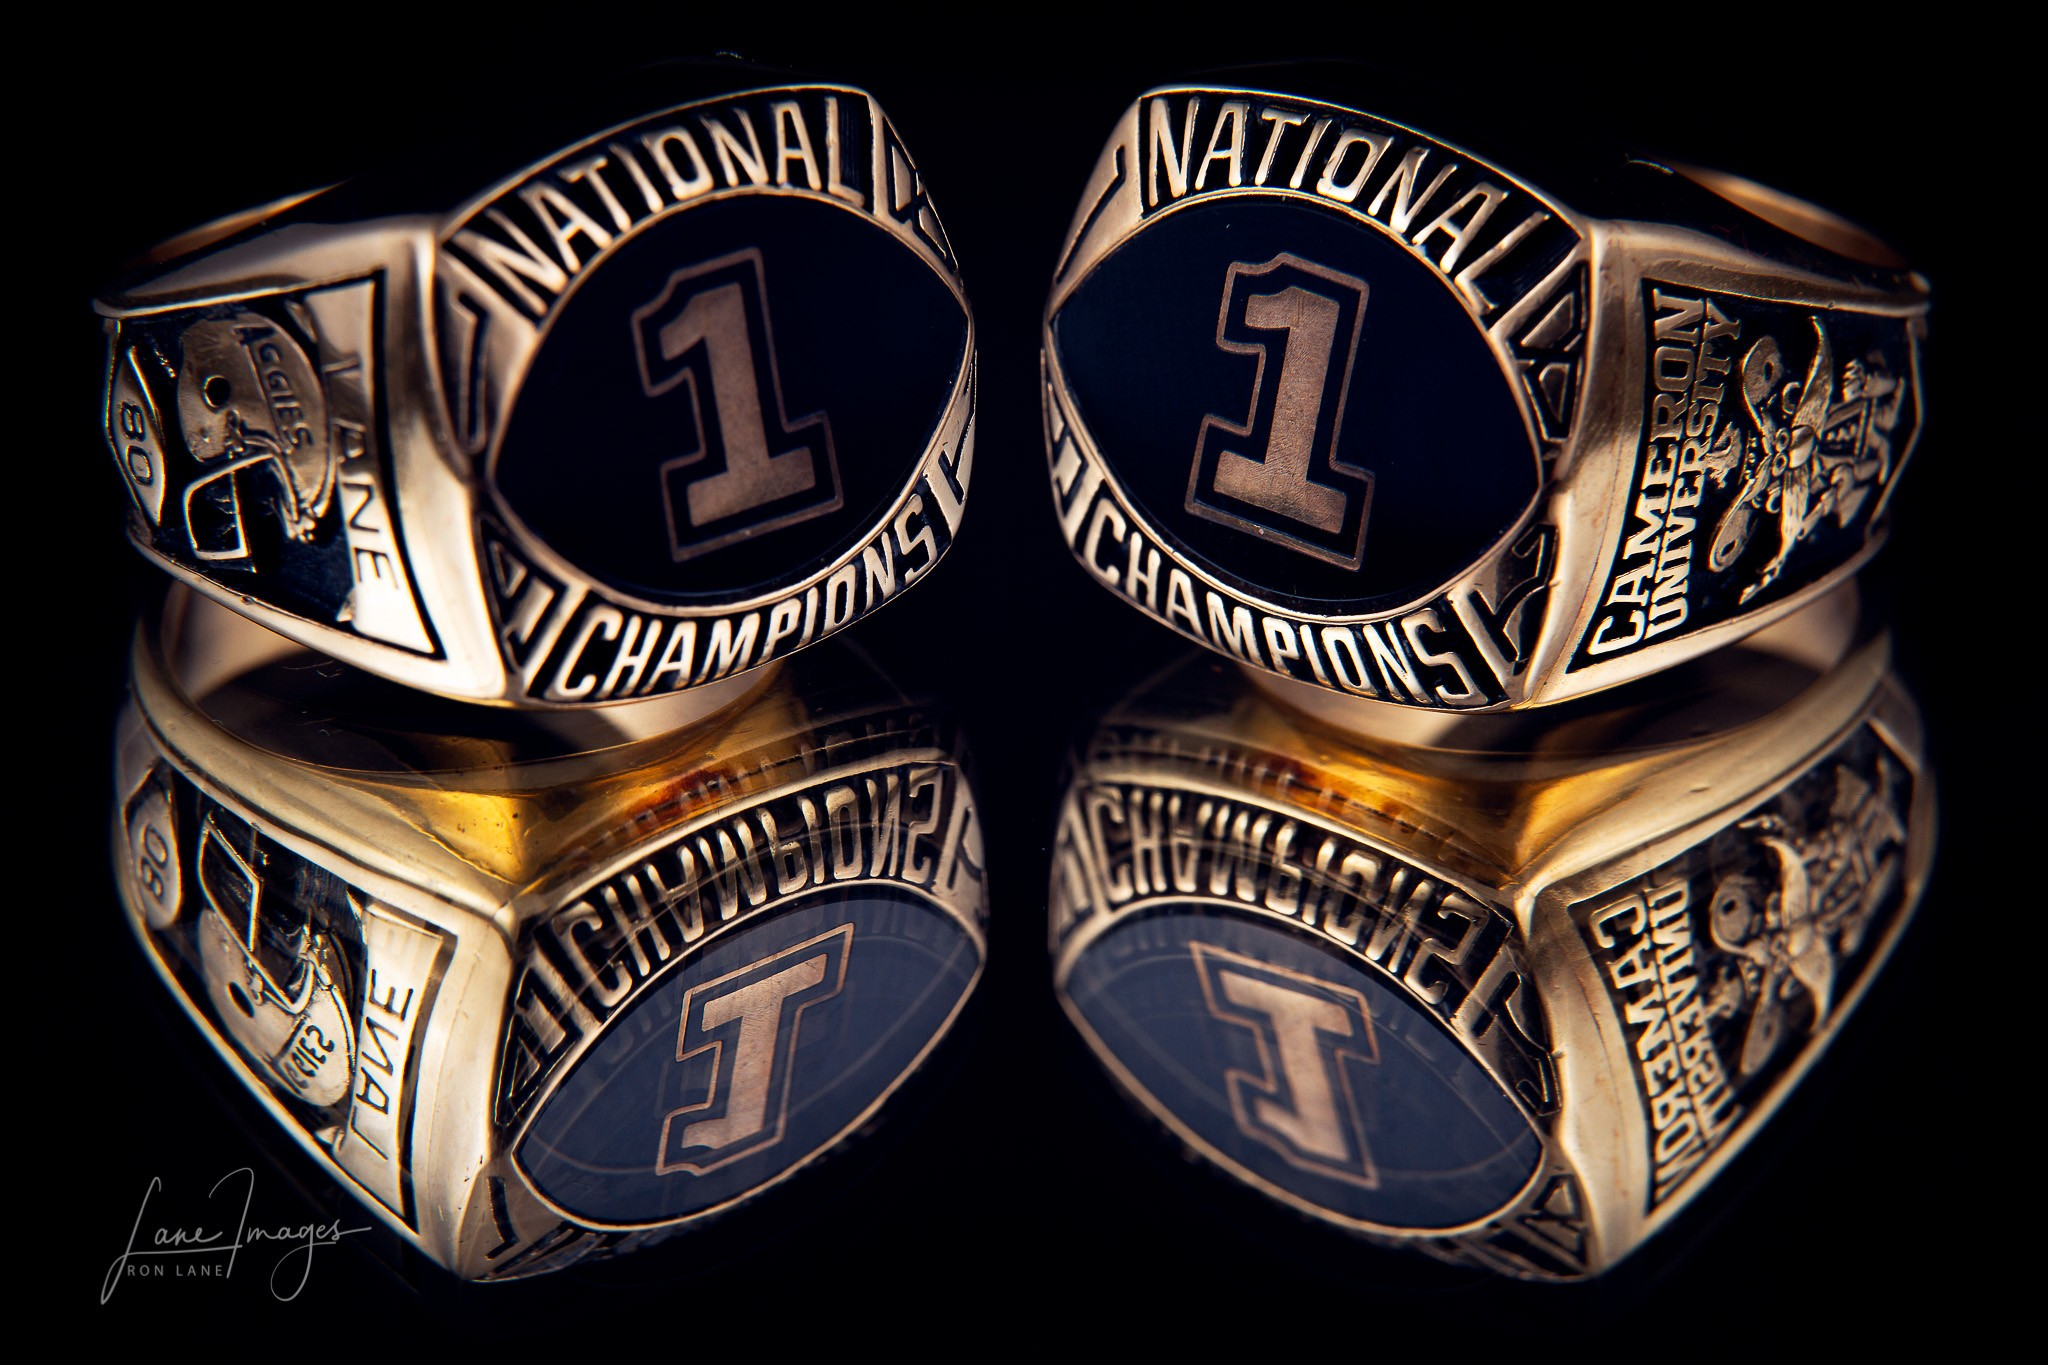 Champ-ring-1-Edit.jpg